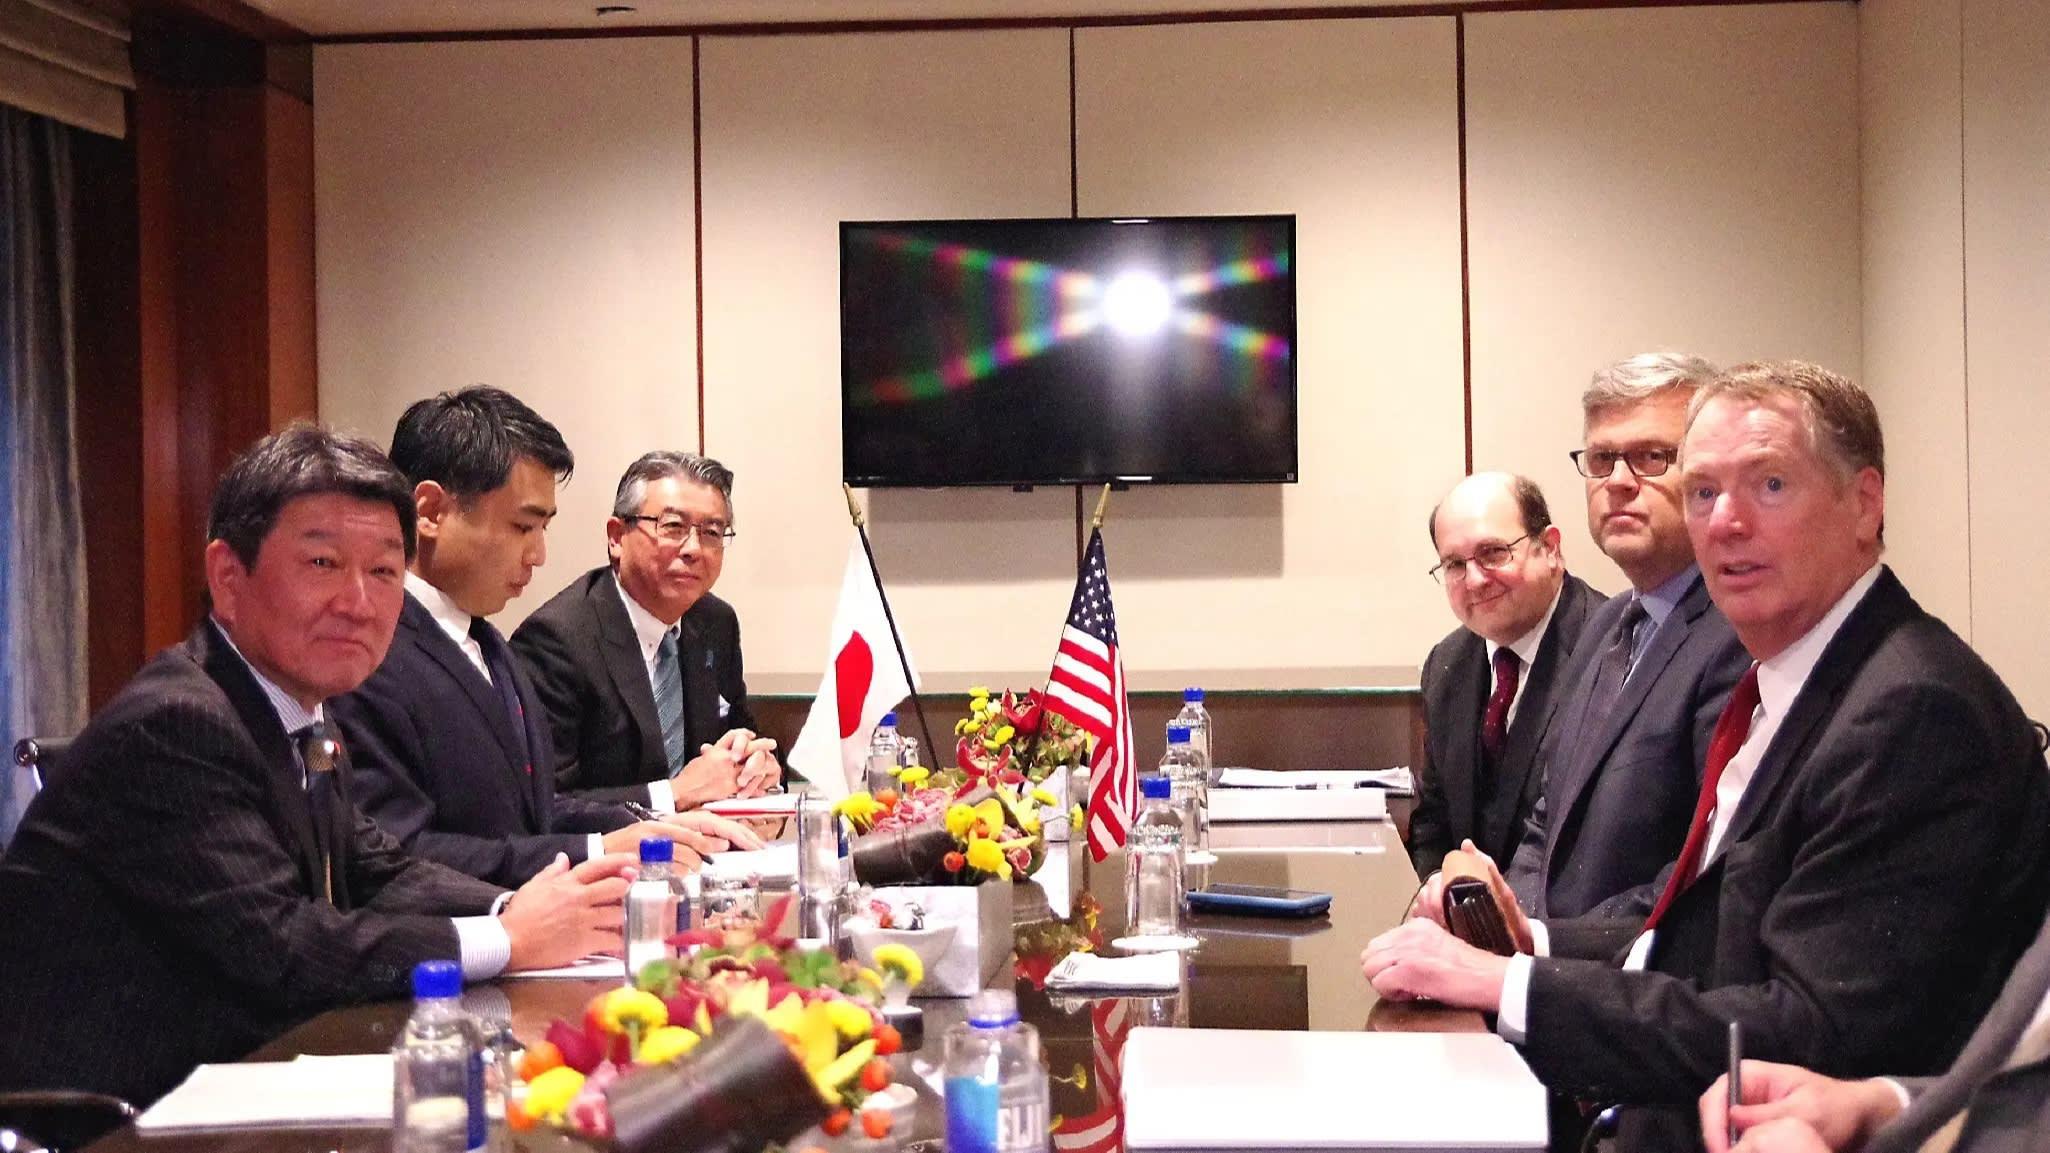 U.S. Trade Representative Robert Lighthizer, far right, spoke with Japan's trade-deal point man Toshimitsu Motegi, far left,in New York in September.